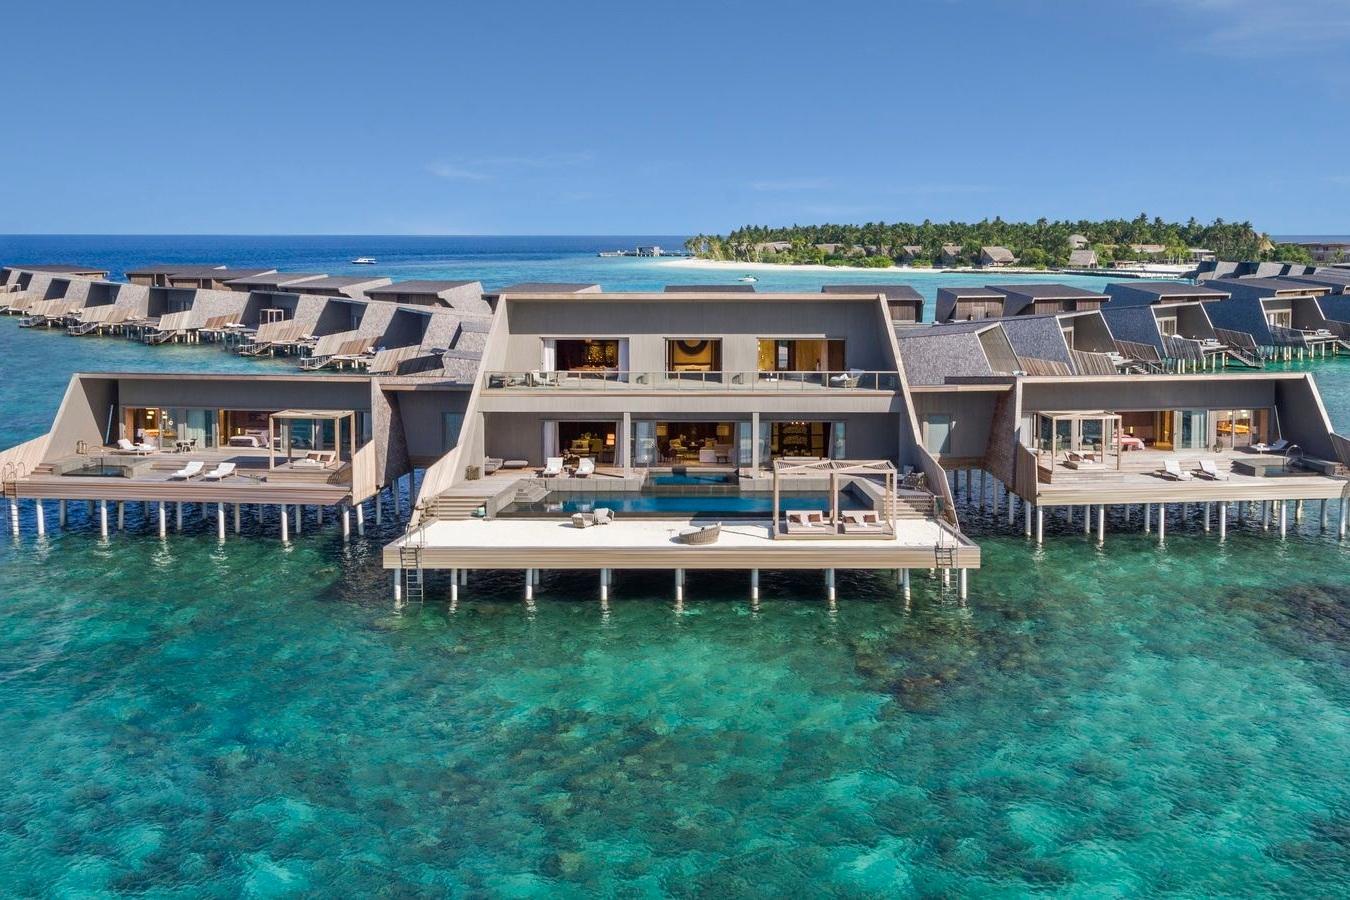 St. Regis Maldives